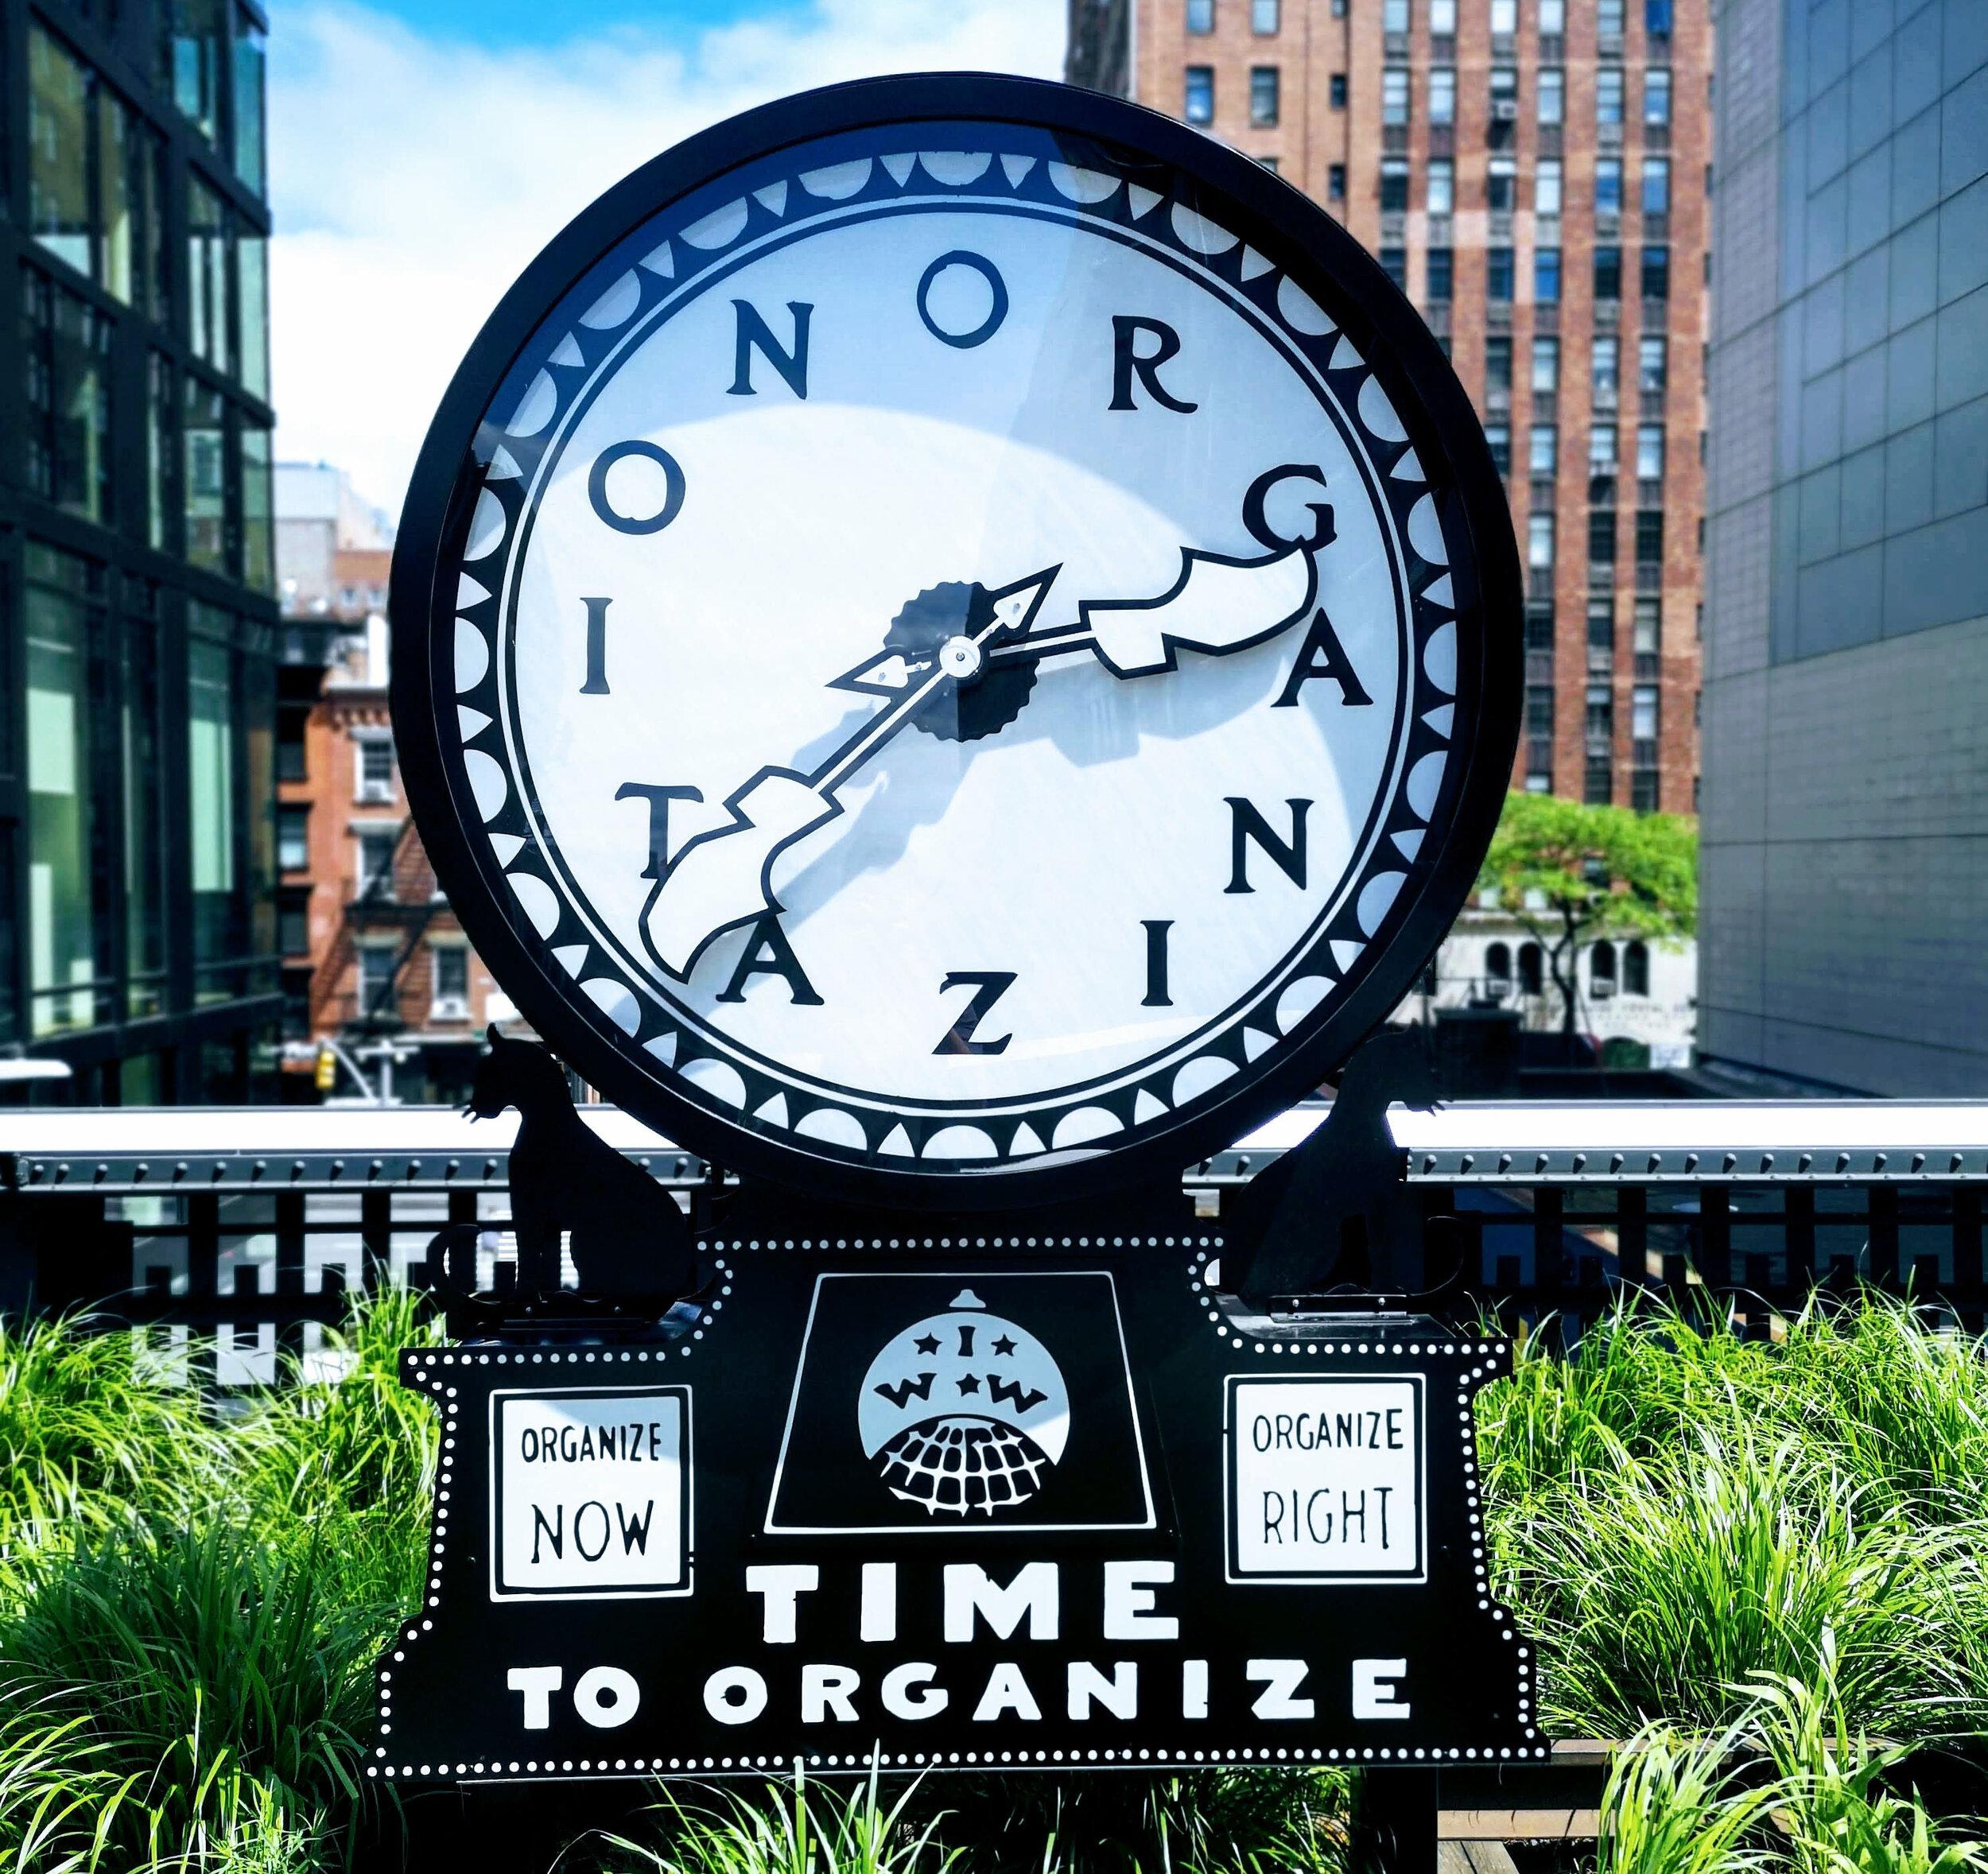 organize-time